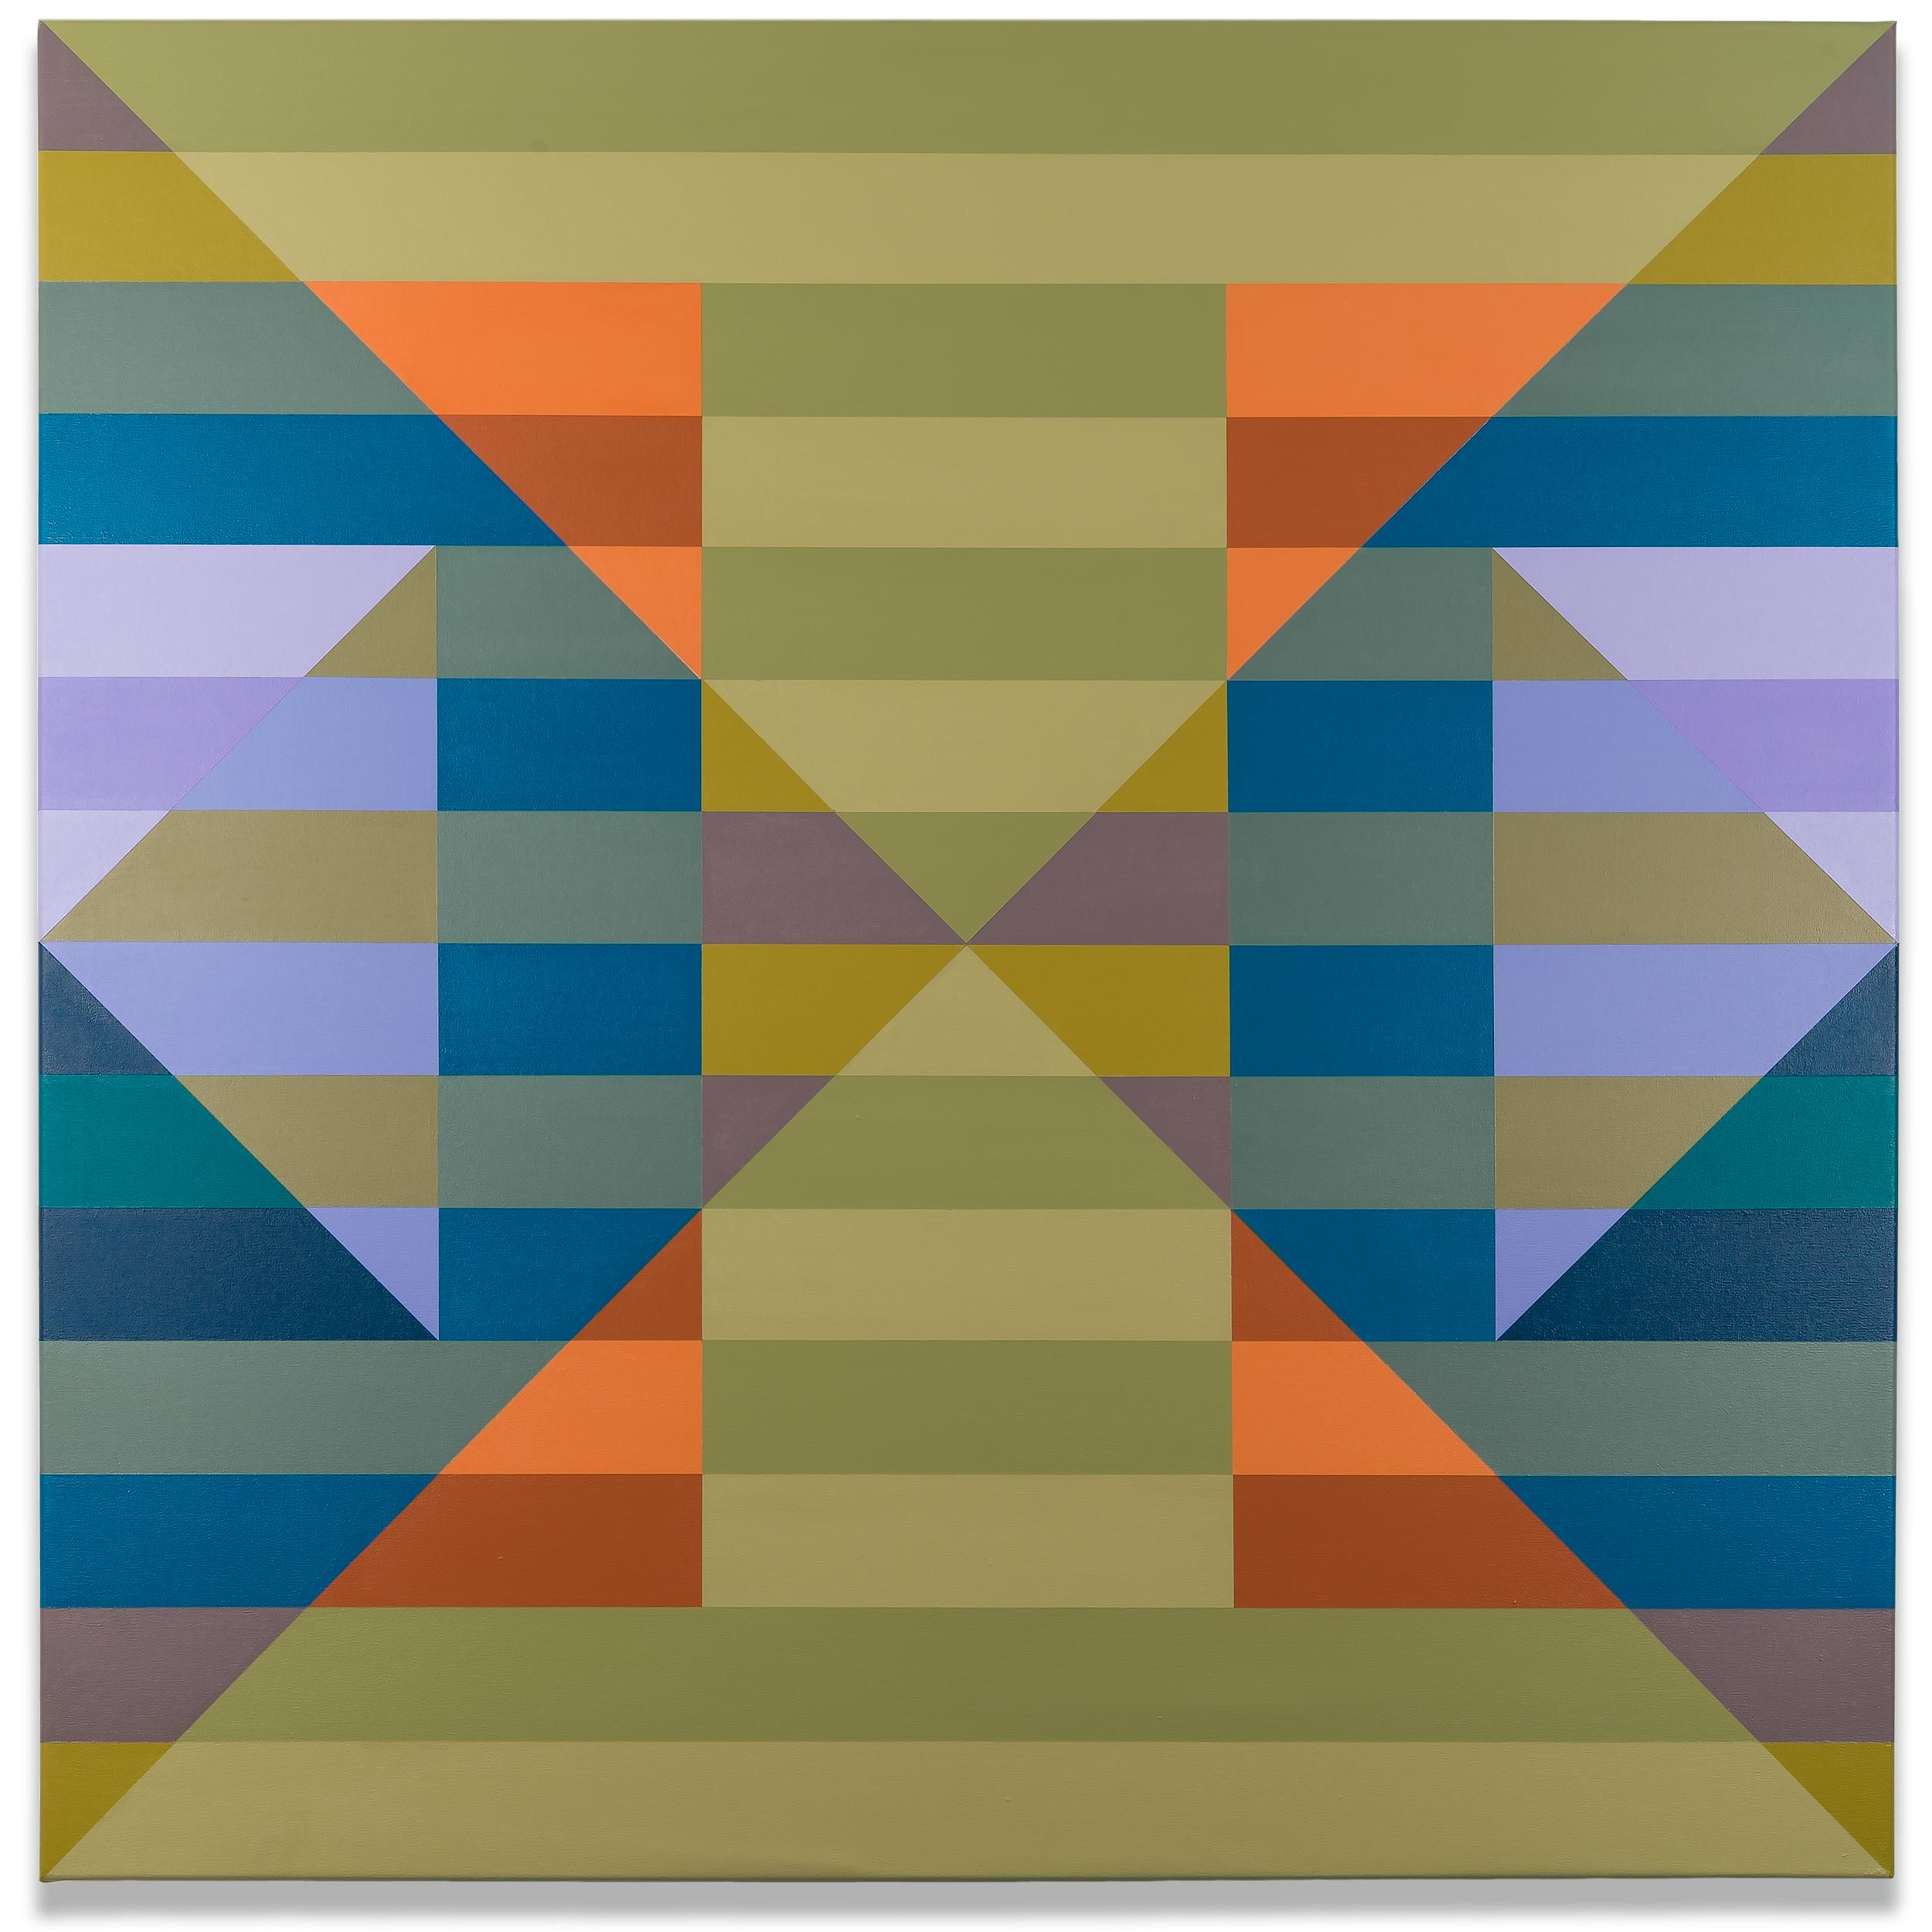 Qualia 160 acrylic on canvas 48 x 48 inches 2016